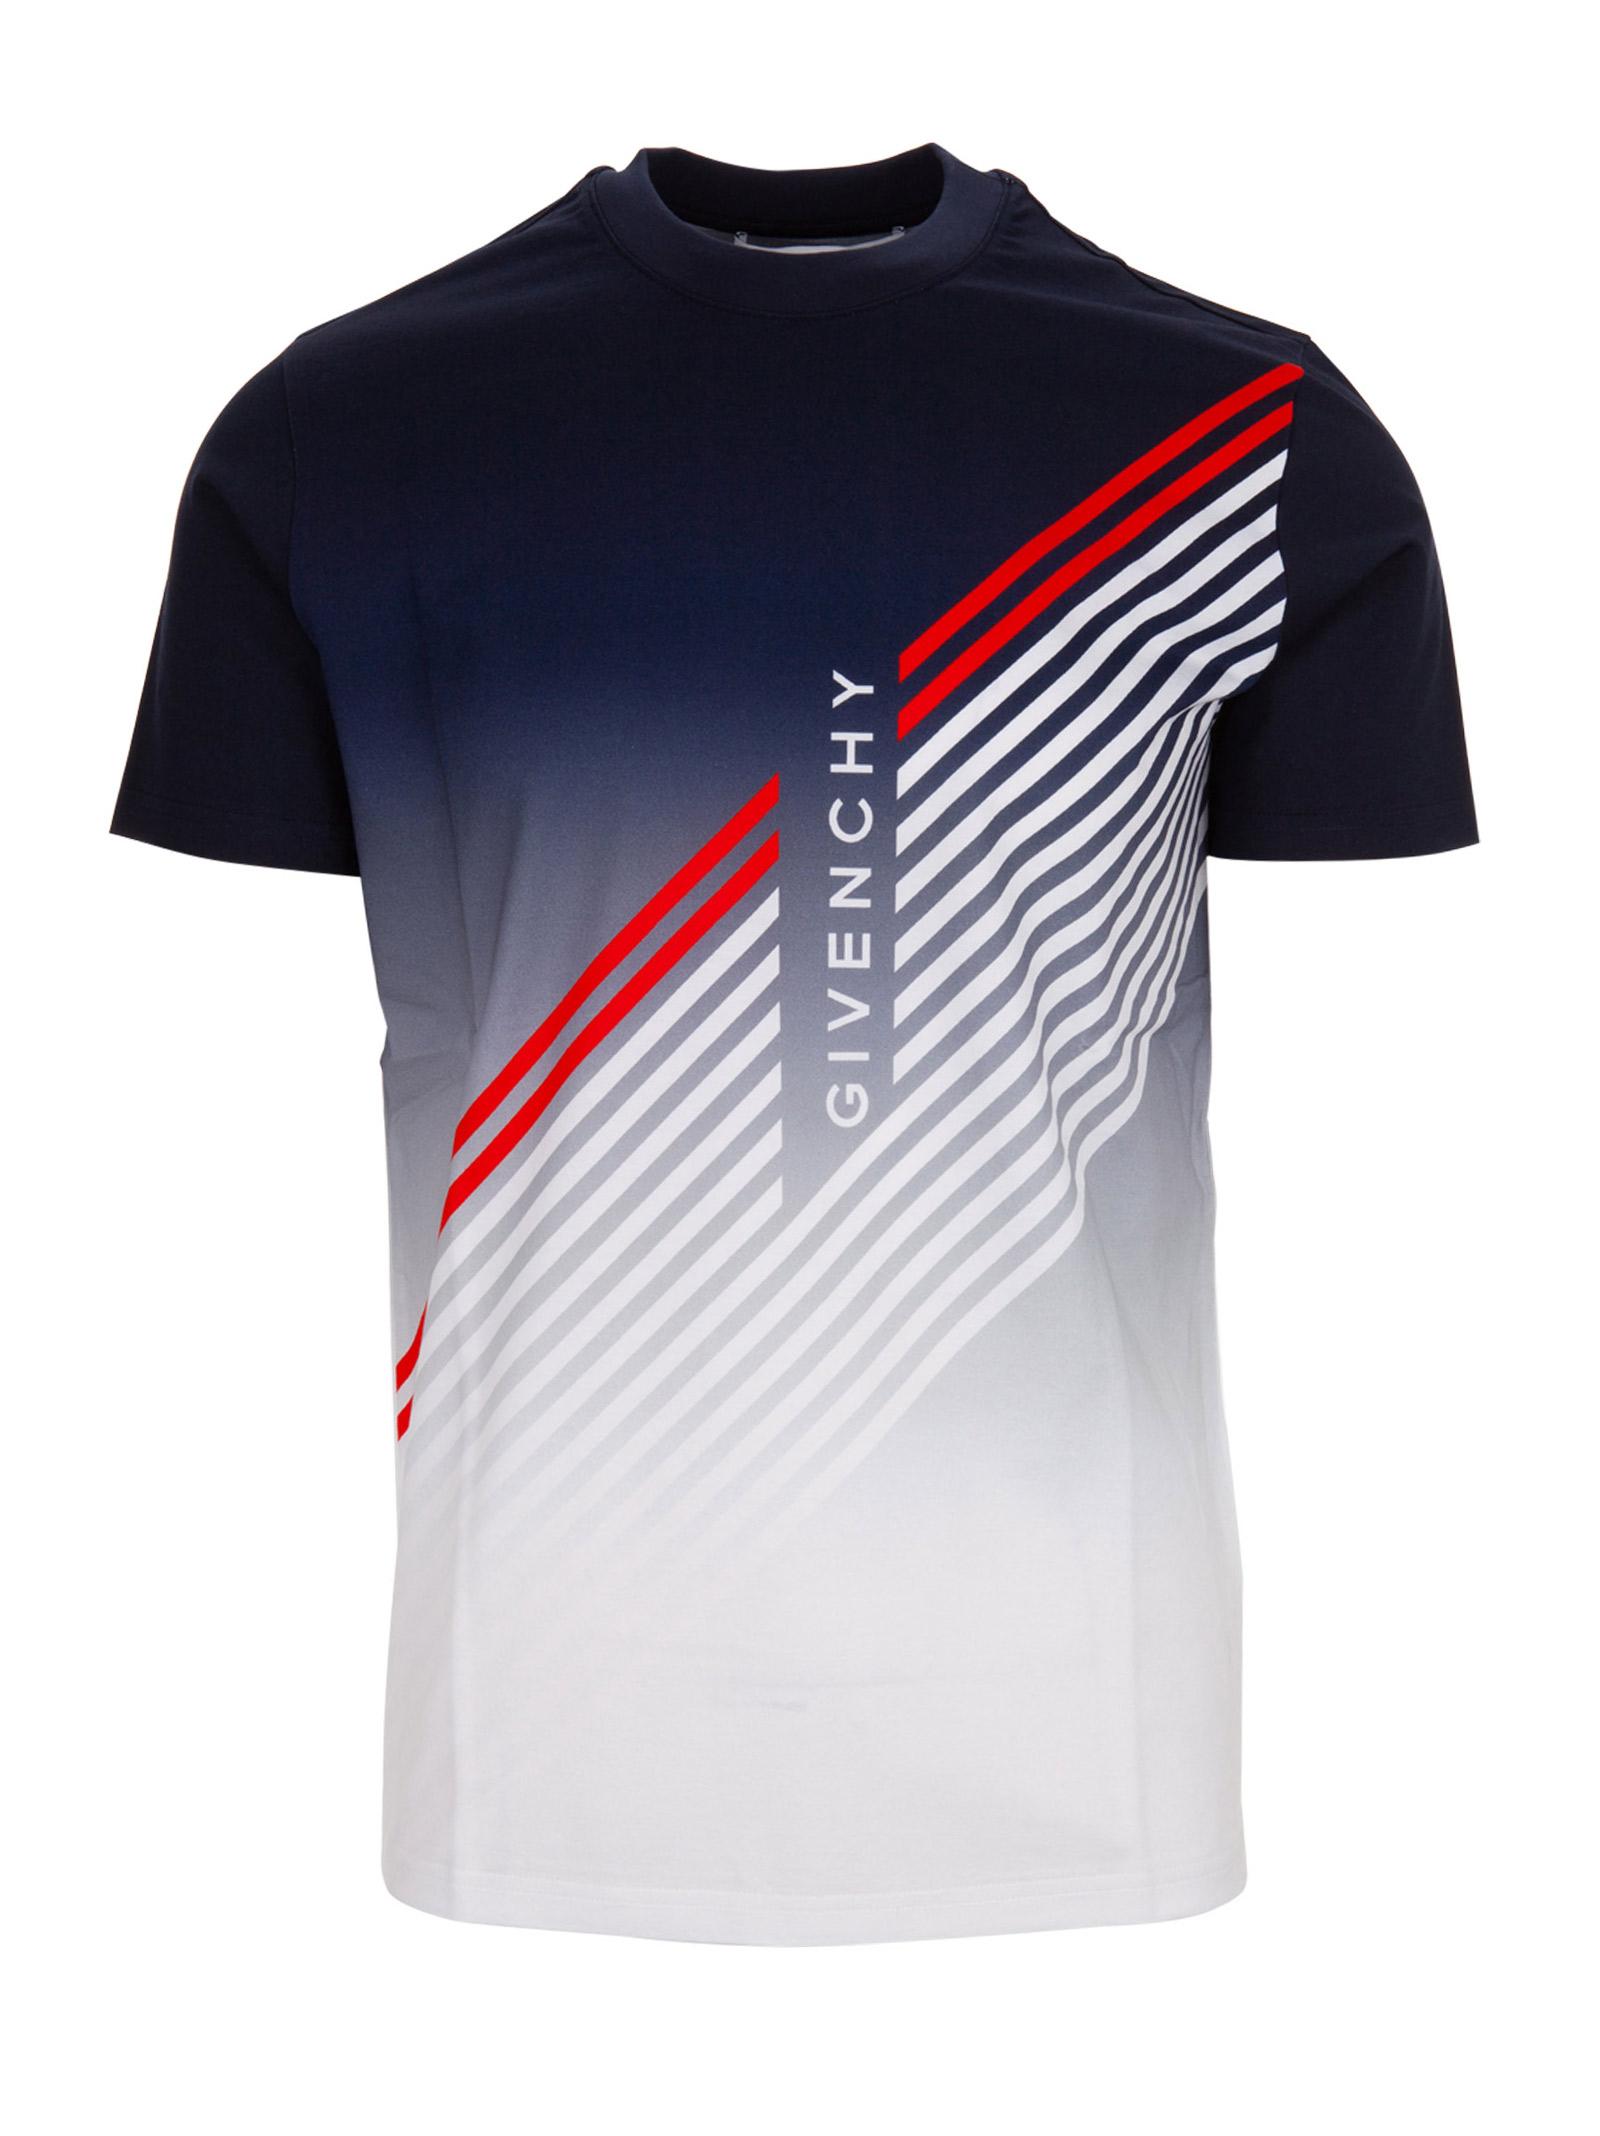 2ca7e13218c8 Givenchy t-shirt - Givenchy - Michele Franzese Moda